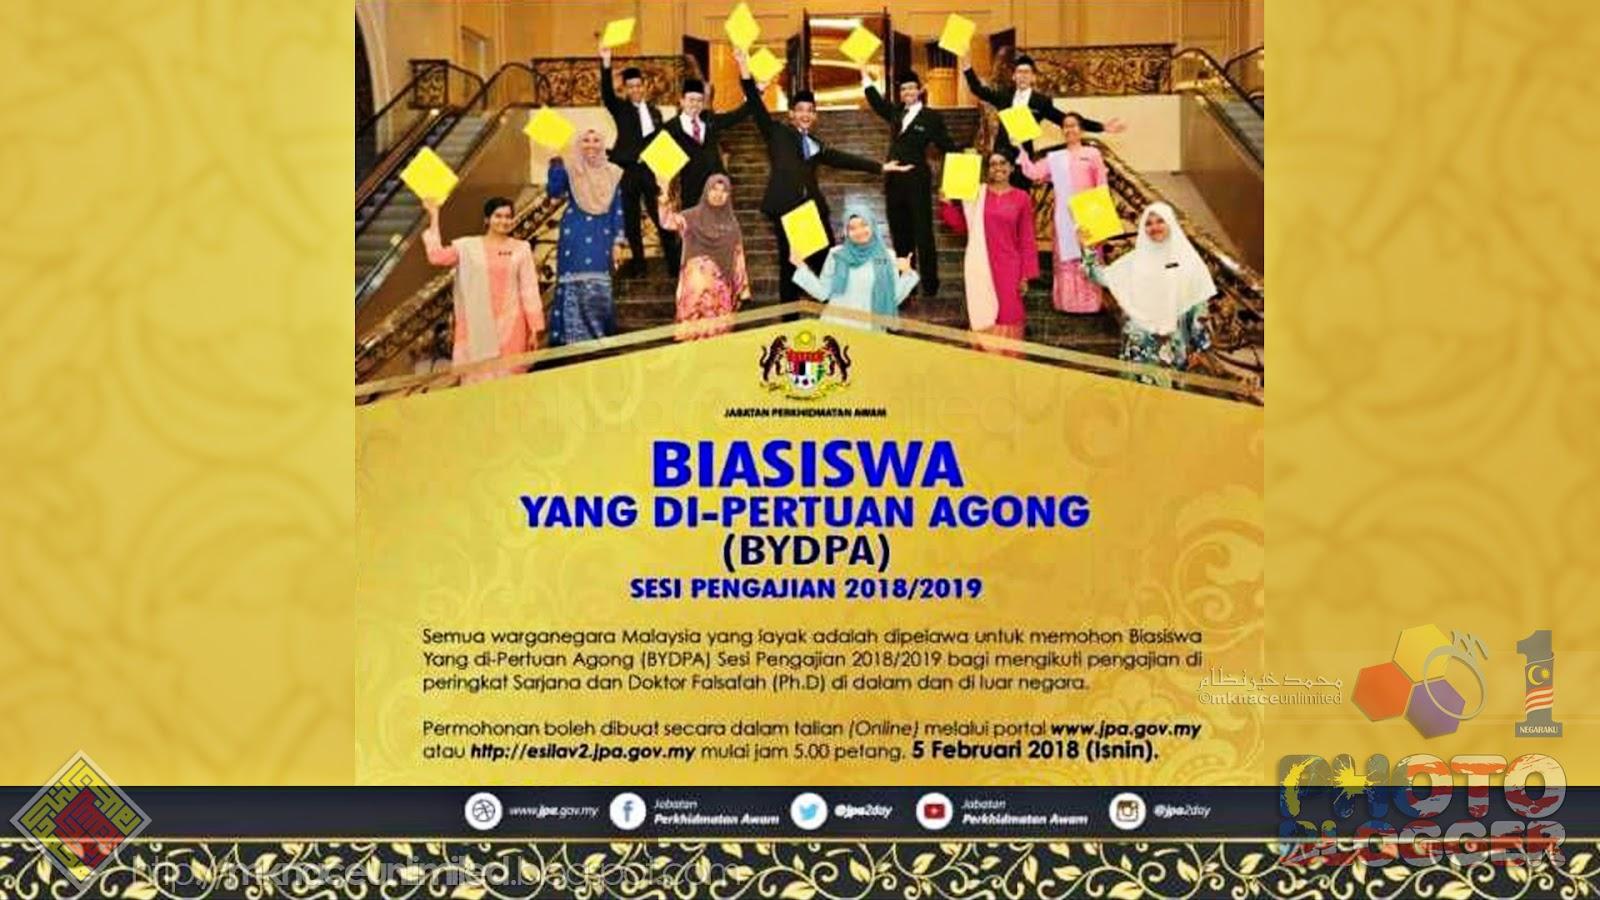 Biasiswa Yang Di Pertuan Agong Bydpa Sesi Pengajian 2018 2019